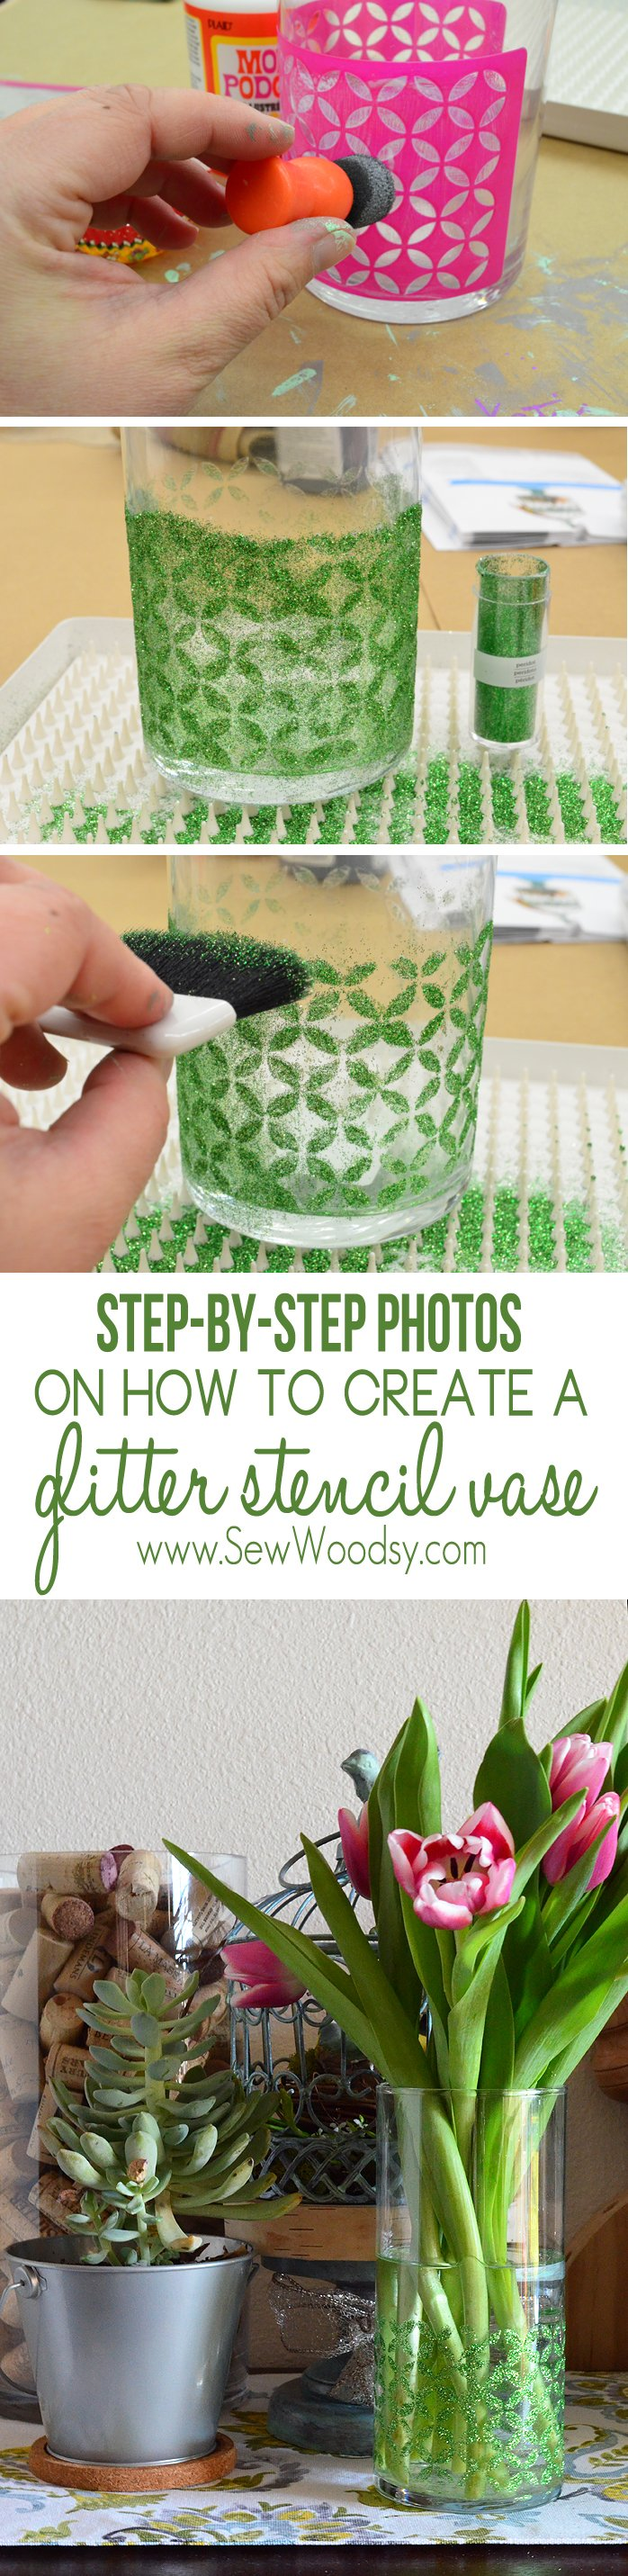 how to create a glitter stencil vase